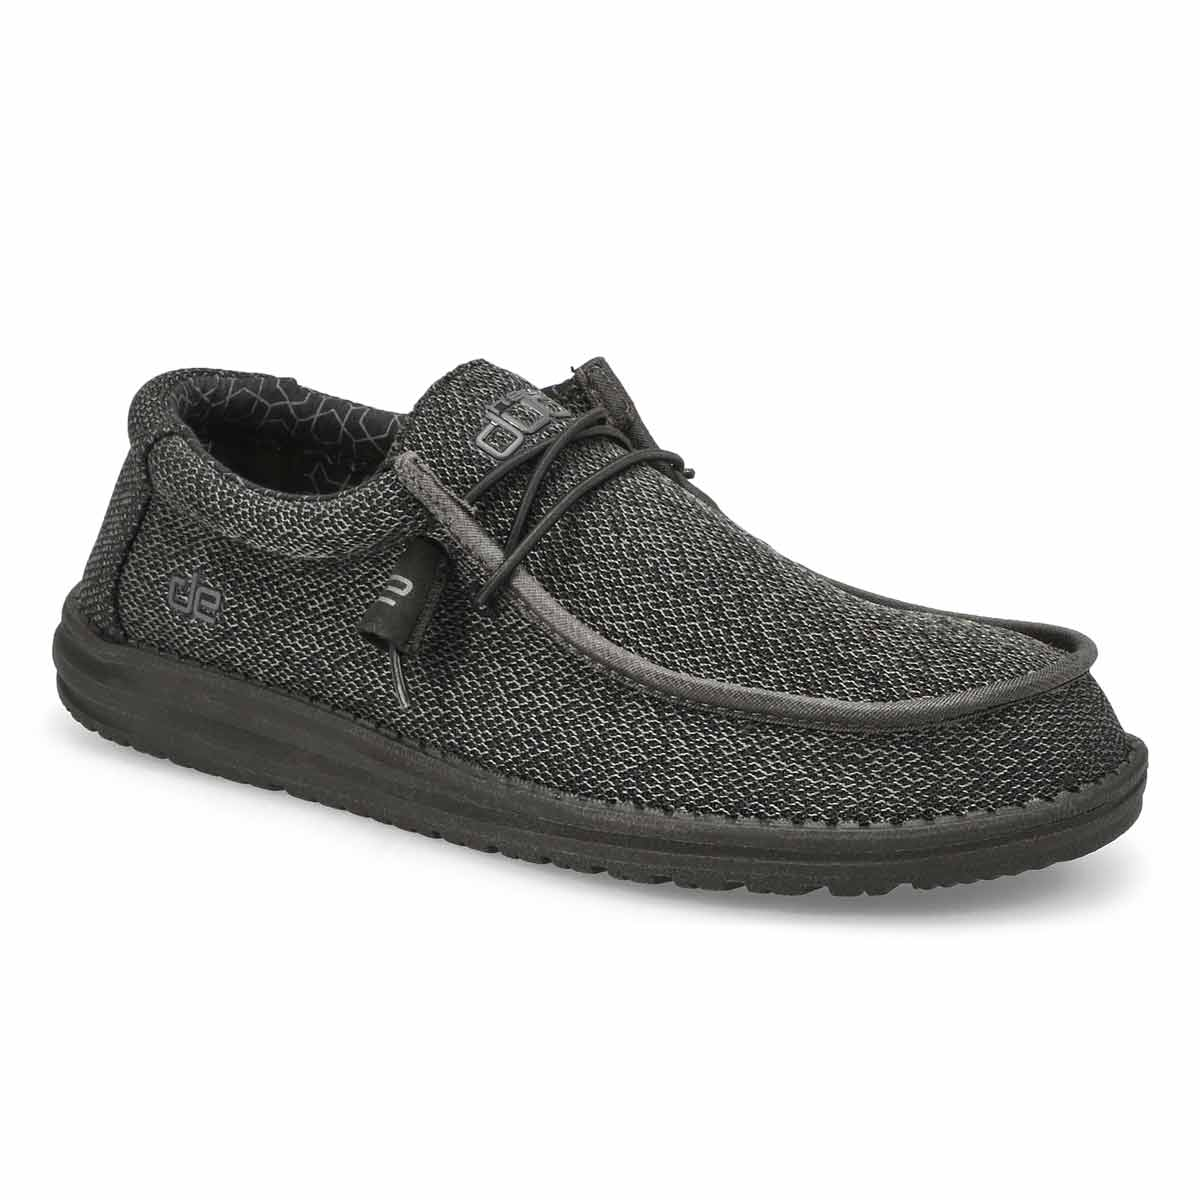 Men's Wally Sox Micro Casual Shoe - Black